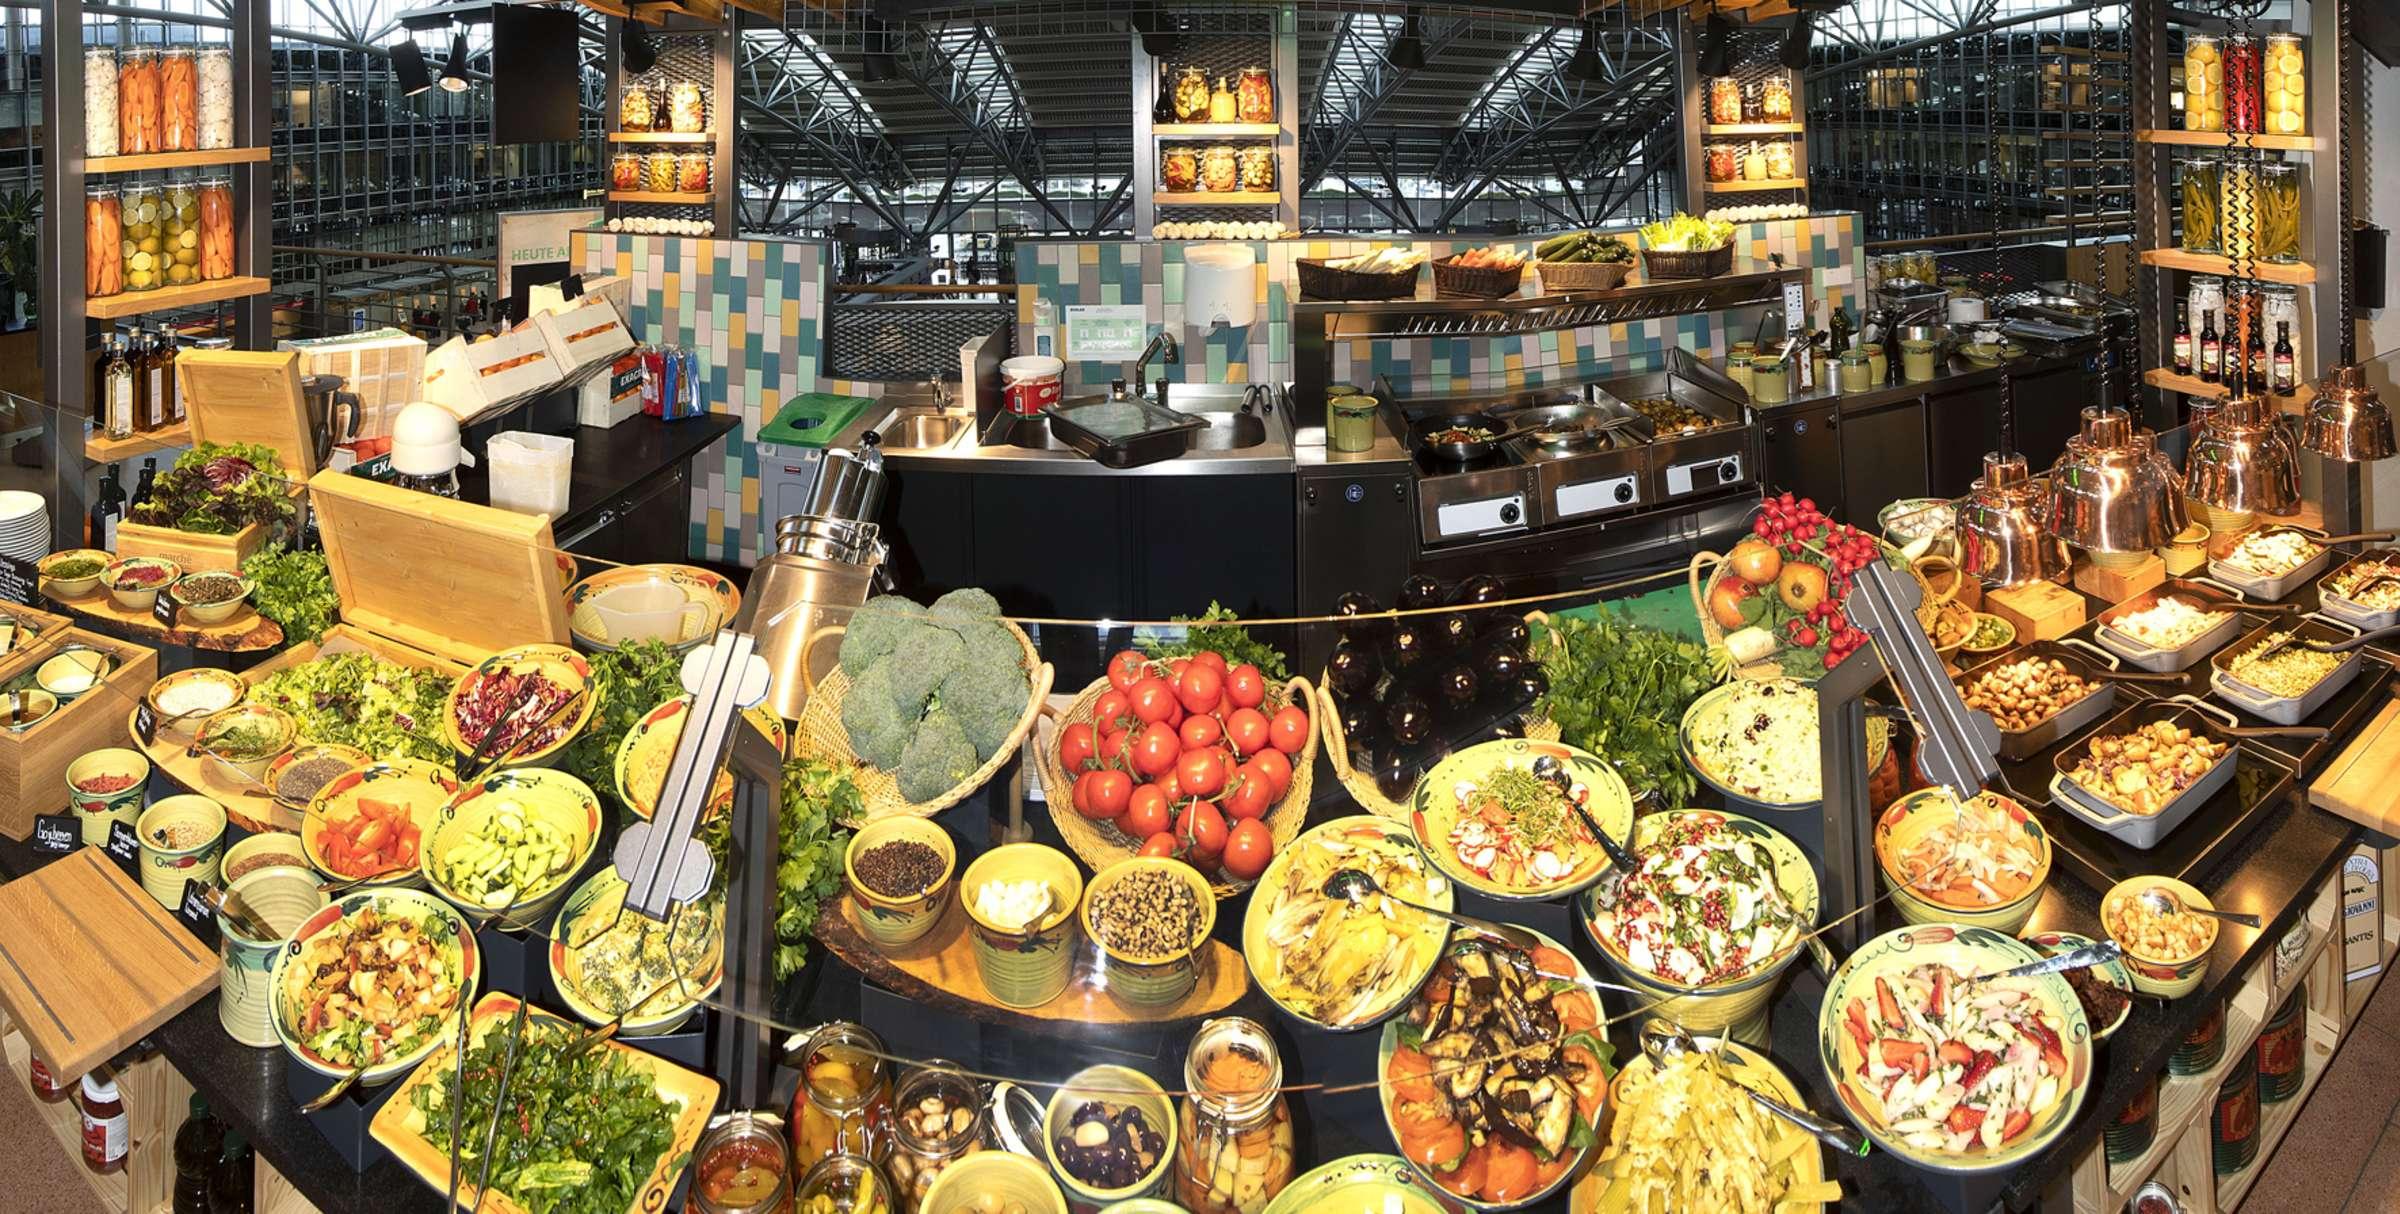 Marché Mövenpick Hamburg Airport Vegetarian Island